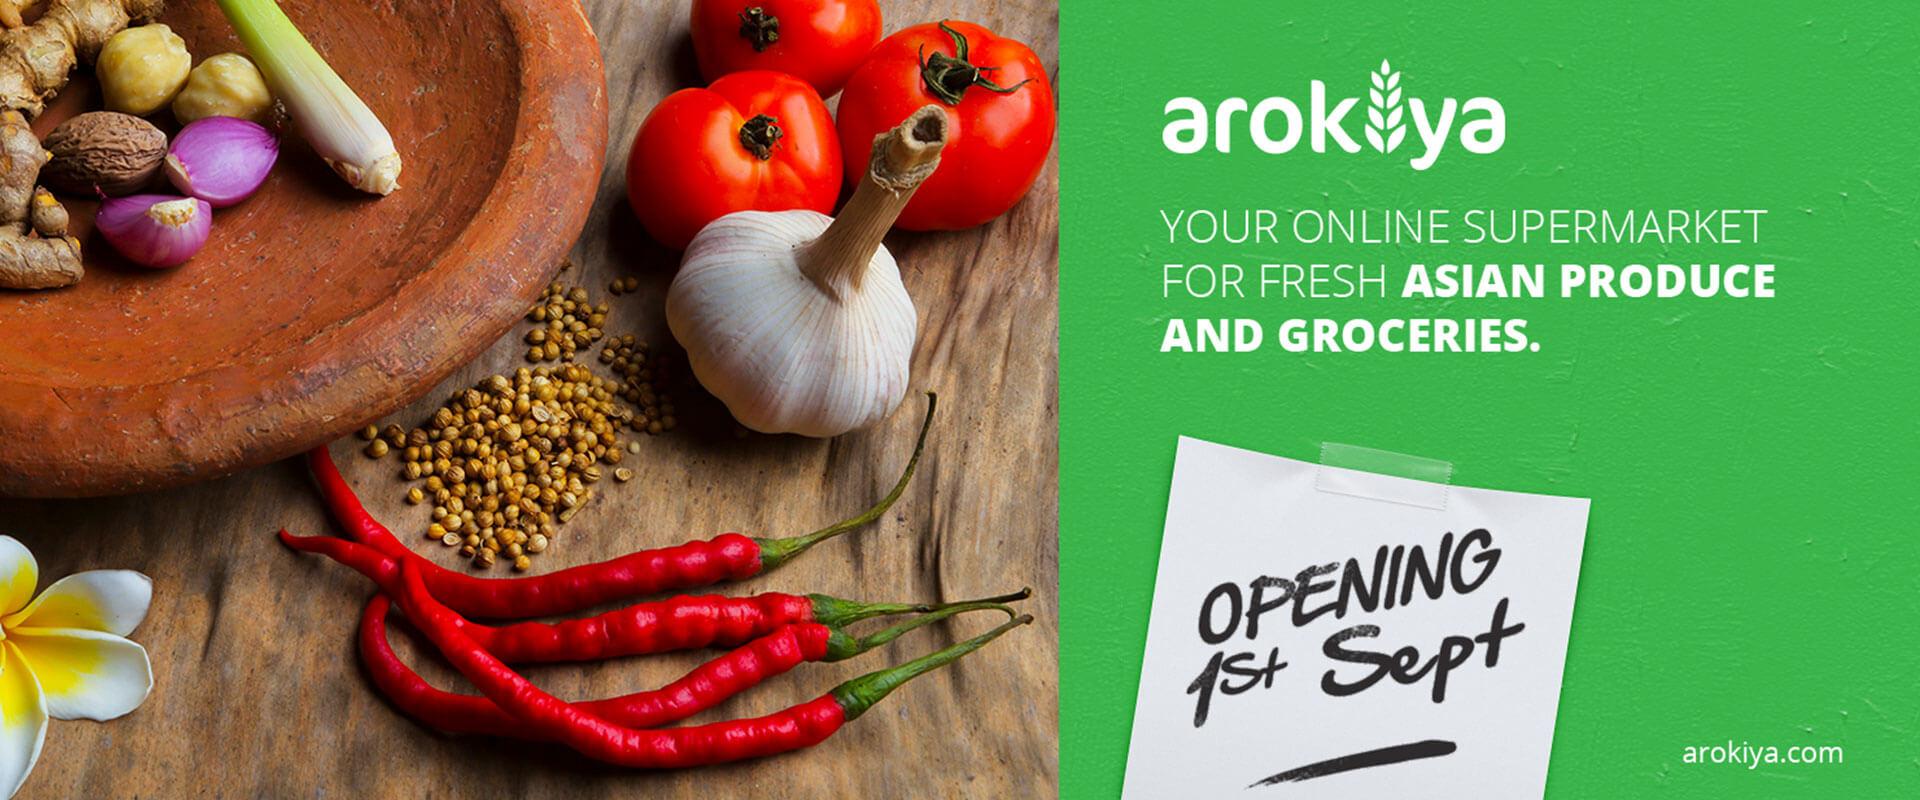 Arokiya opening 1st September